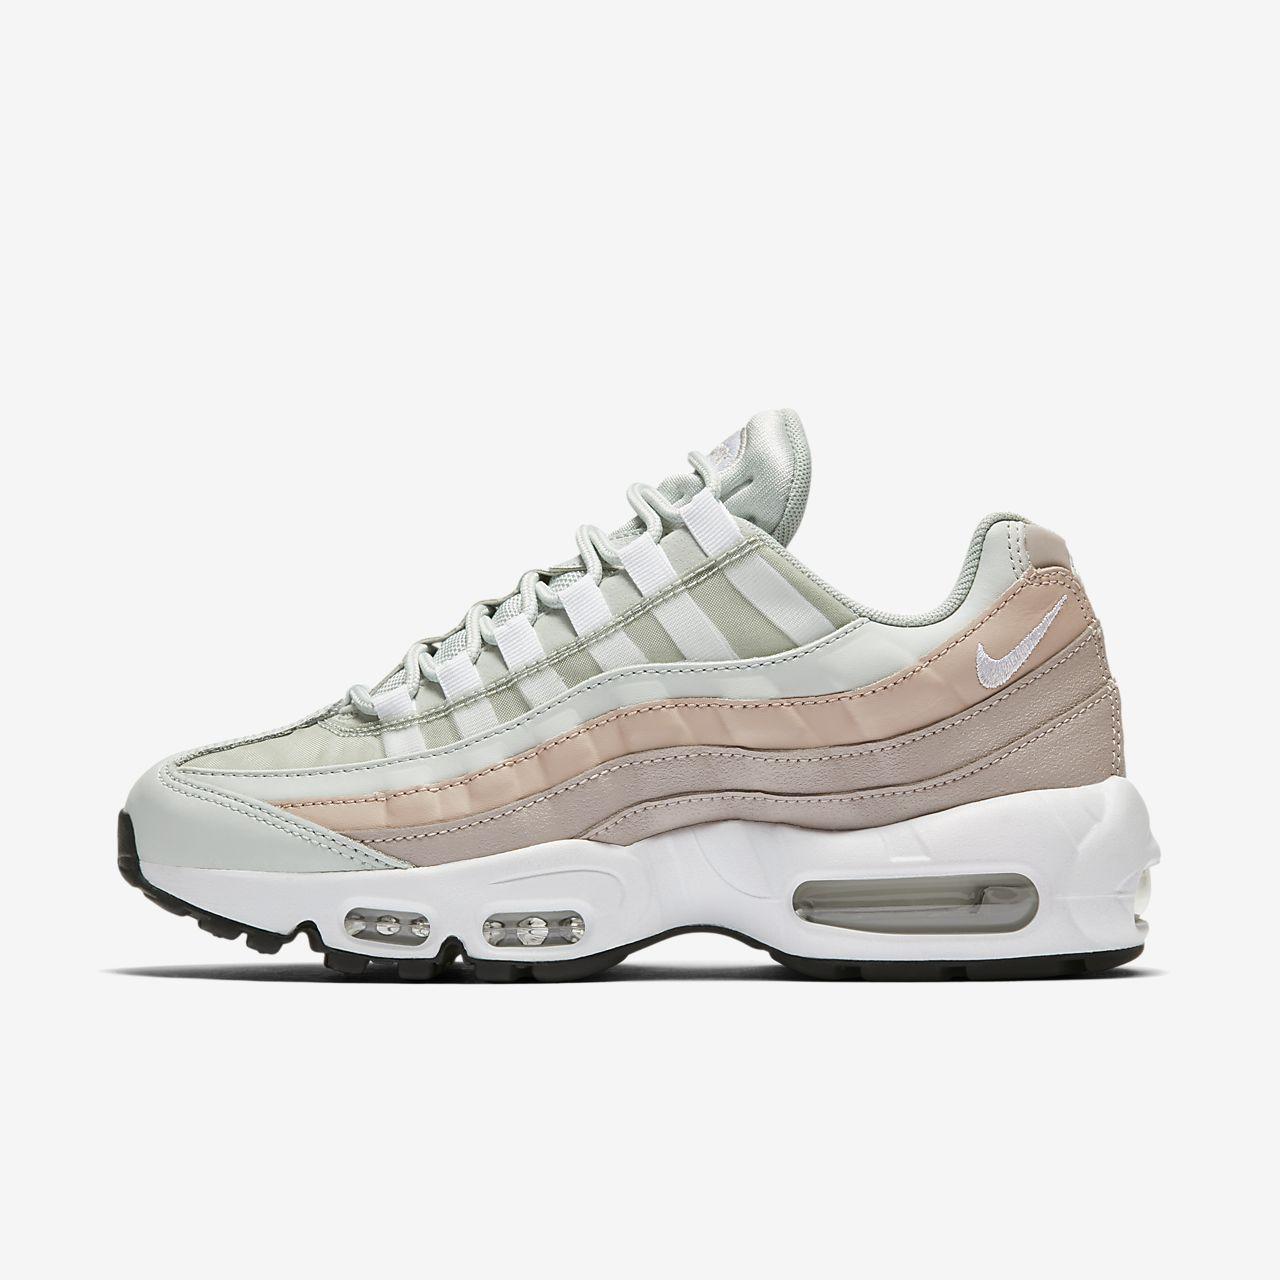 nike femmes chaussures 95